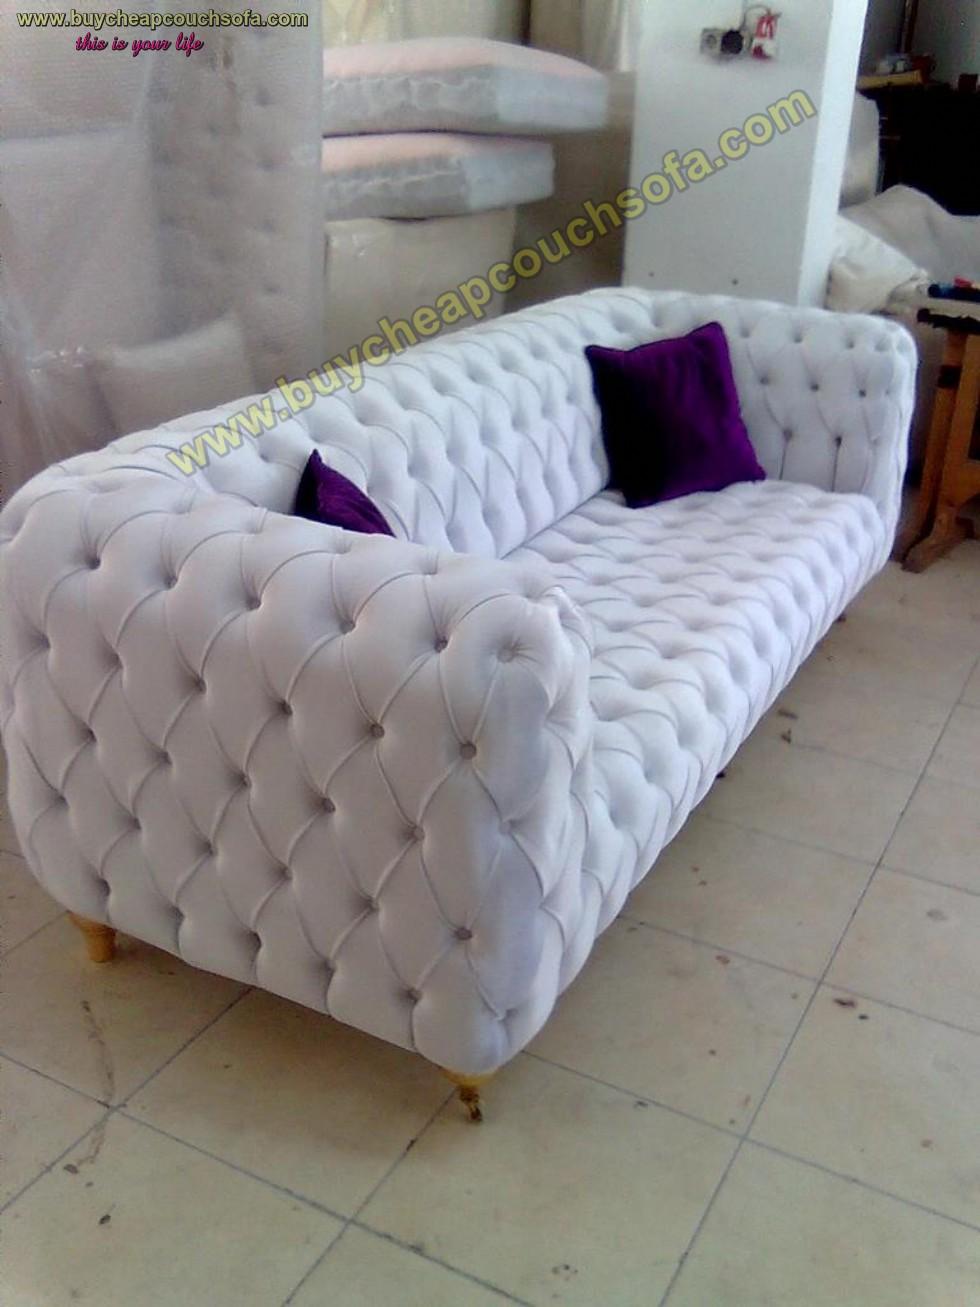 Kodu: 12392 - White Leather Modern Chesterfield Sofa Luxury Handmade Quilted Sofa